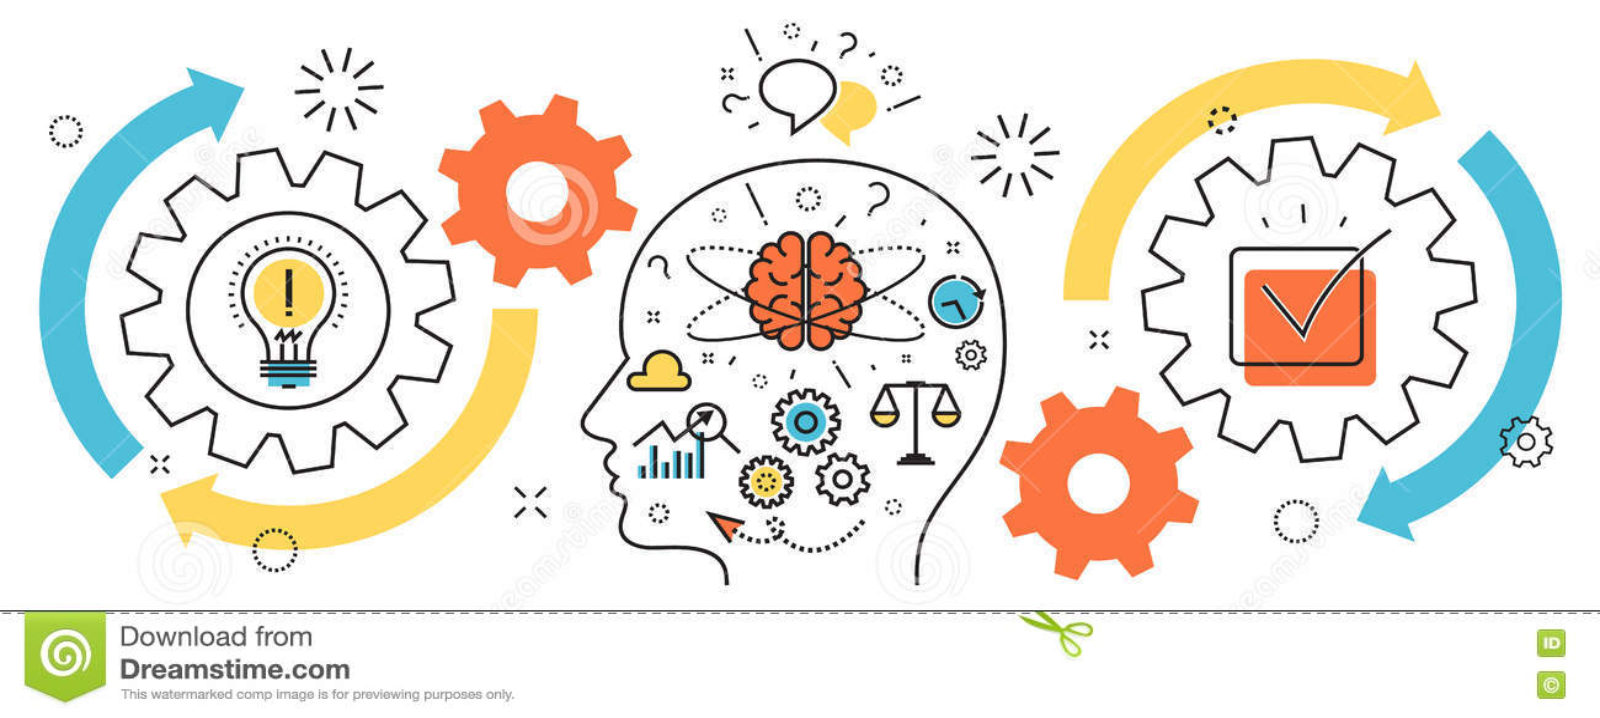 Thought process business startup idea mechanism into man brain